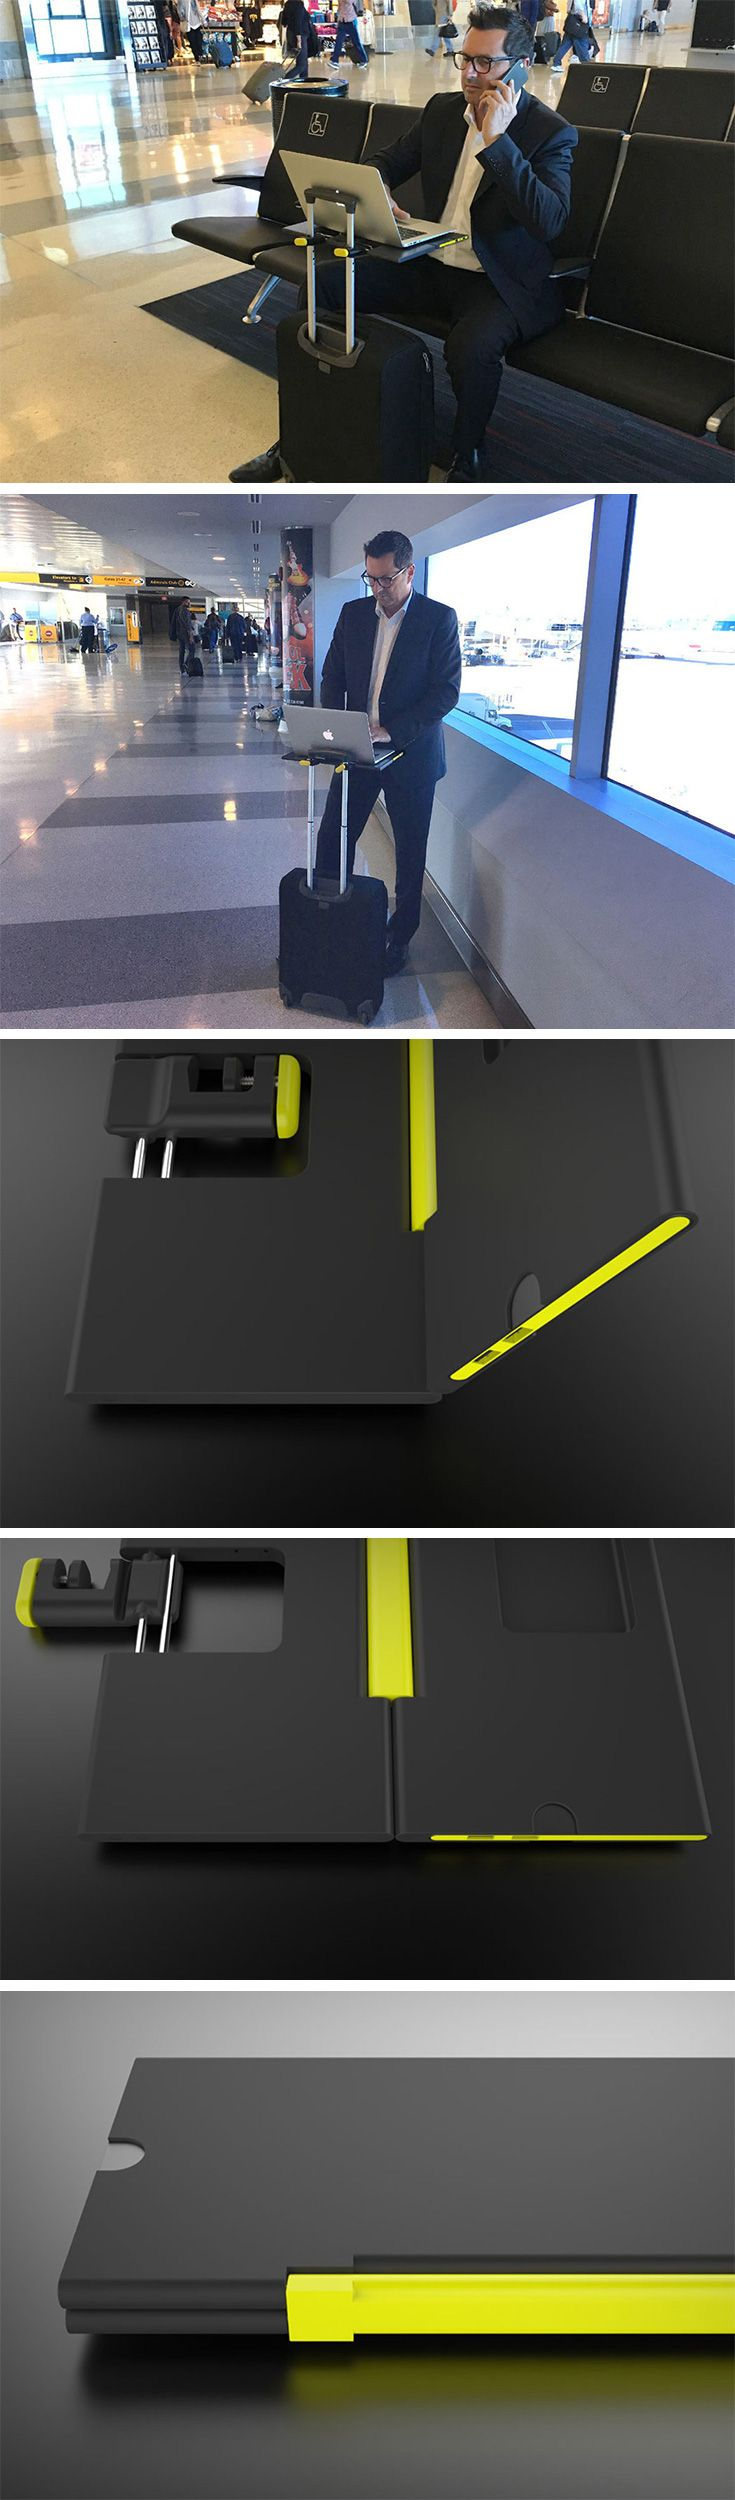 mejores 2988 im genes de latest technology and cool gadgets en pinterest. Black Bedroom Furniture Sets. Home Design Ideas